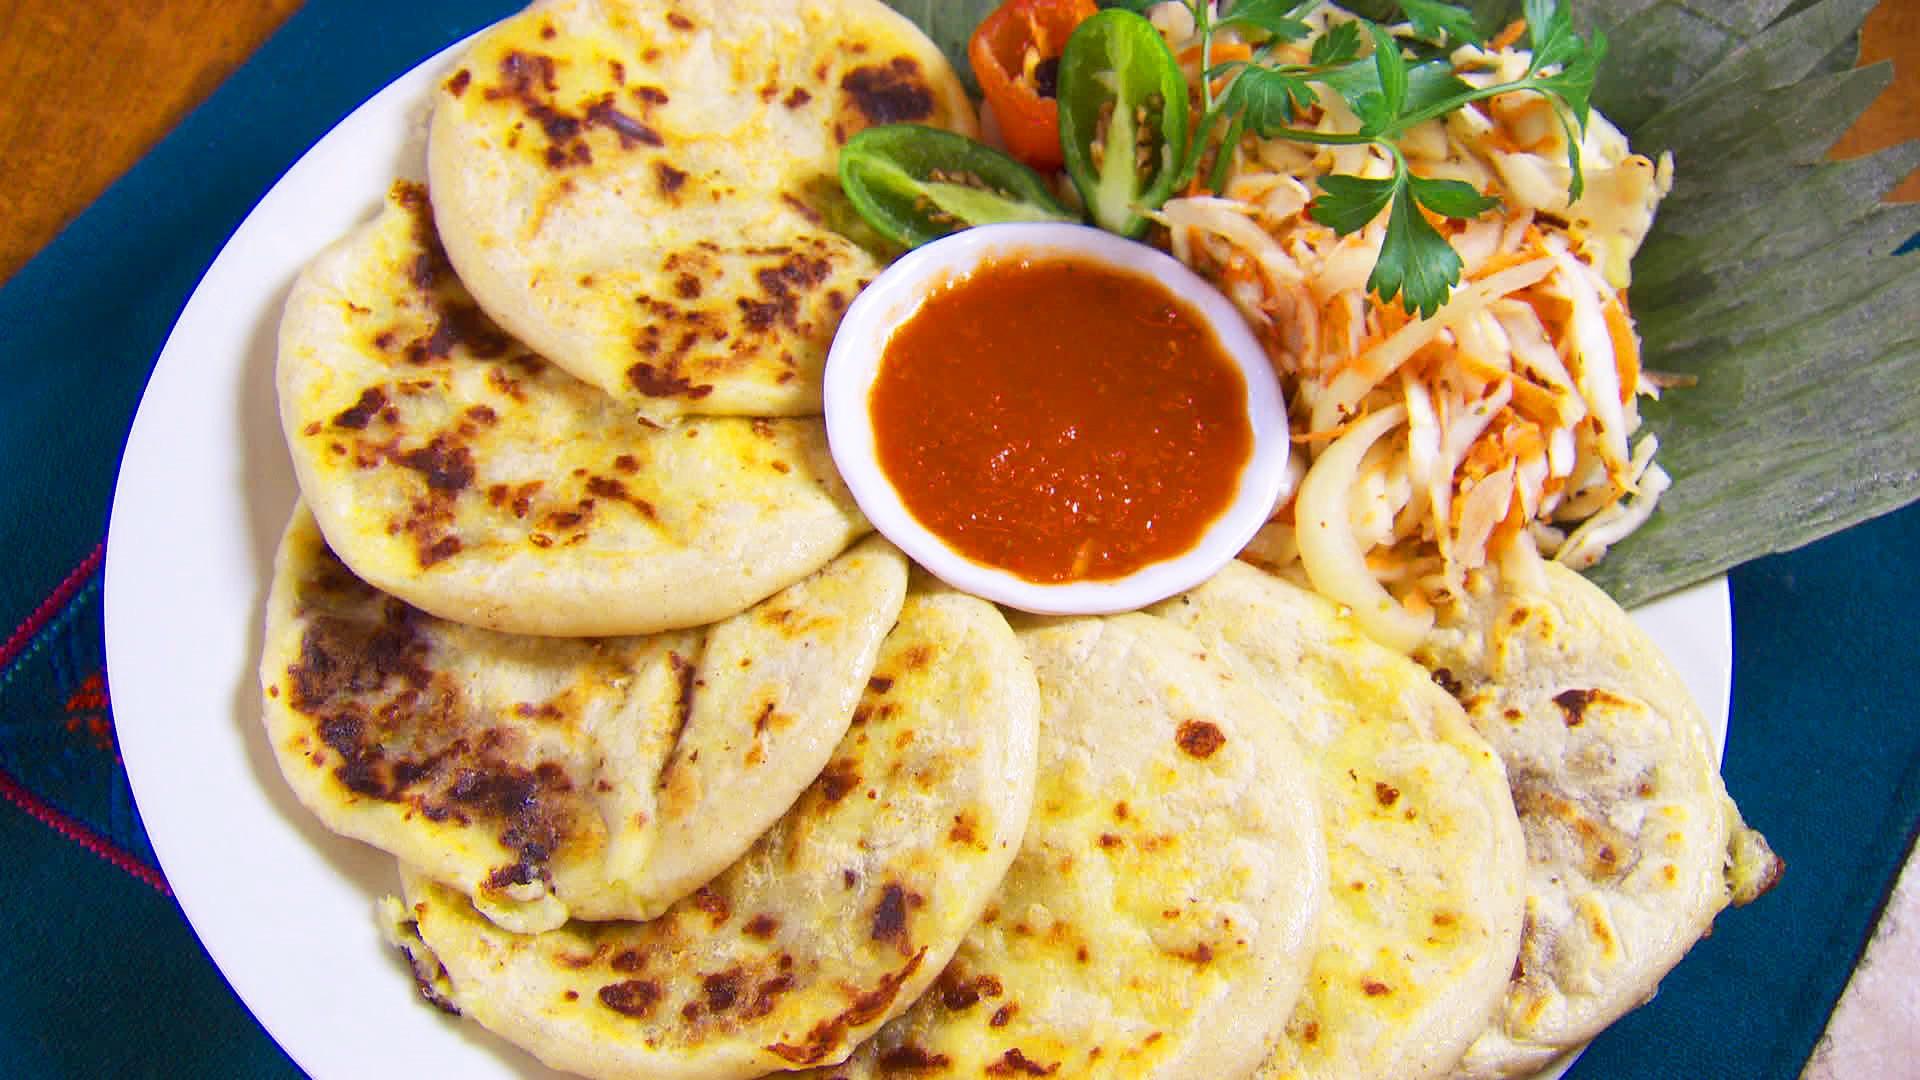 Salvadorian cuisine around the world cultural food festival salvadorian cuisine forumfinder Image collections